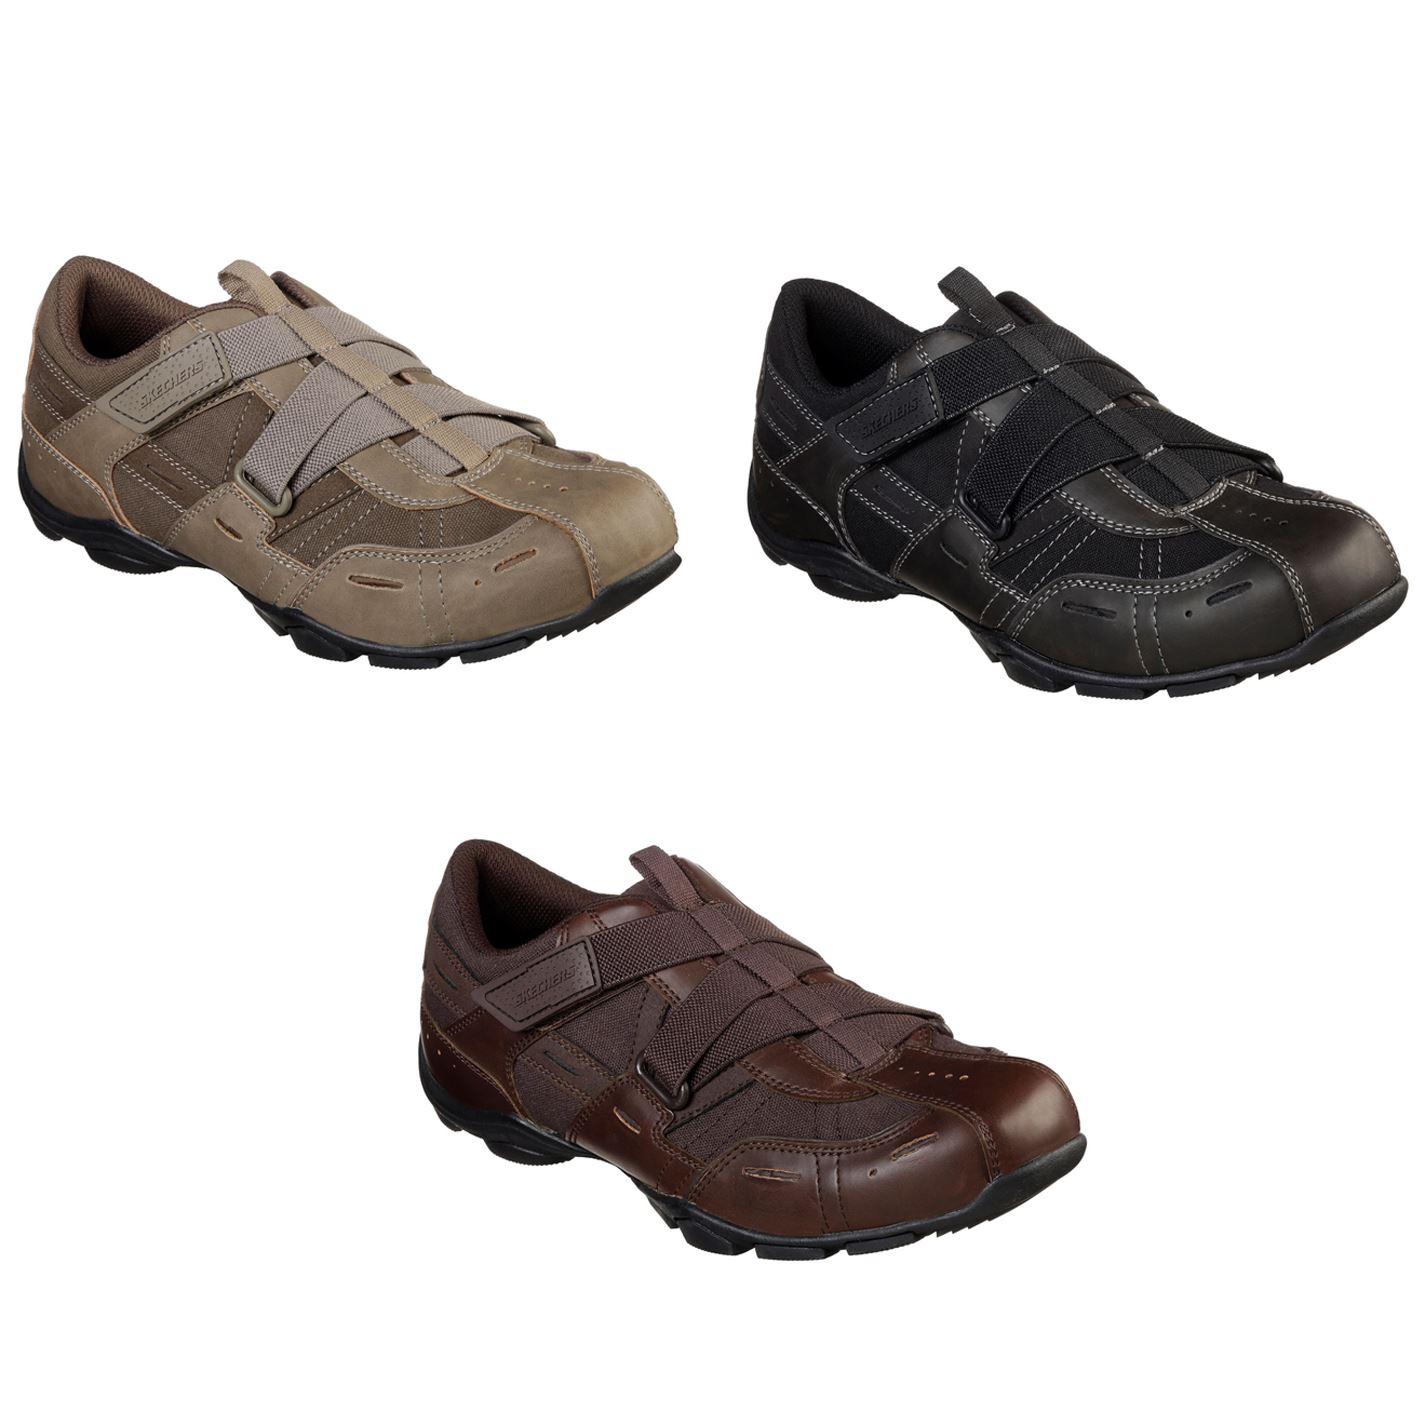 skechers martens mens shoes \u003e Clearance